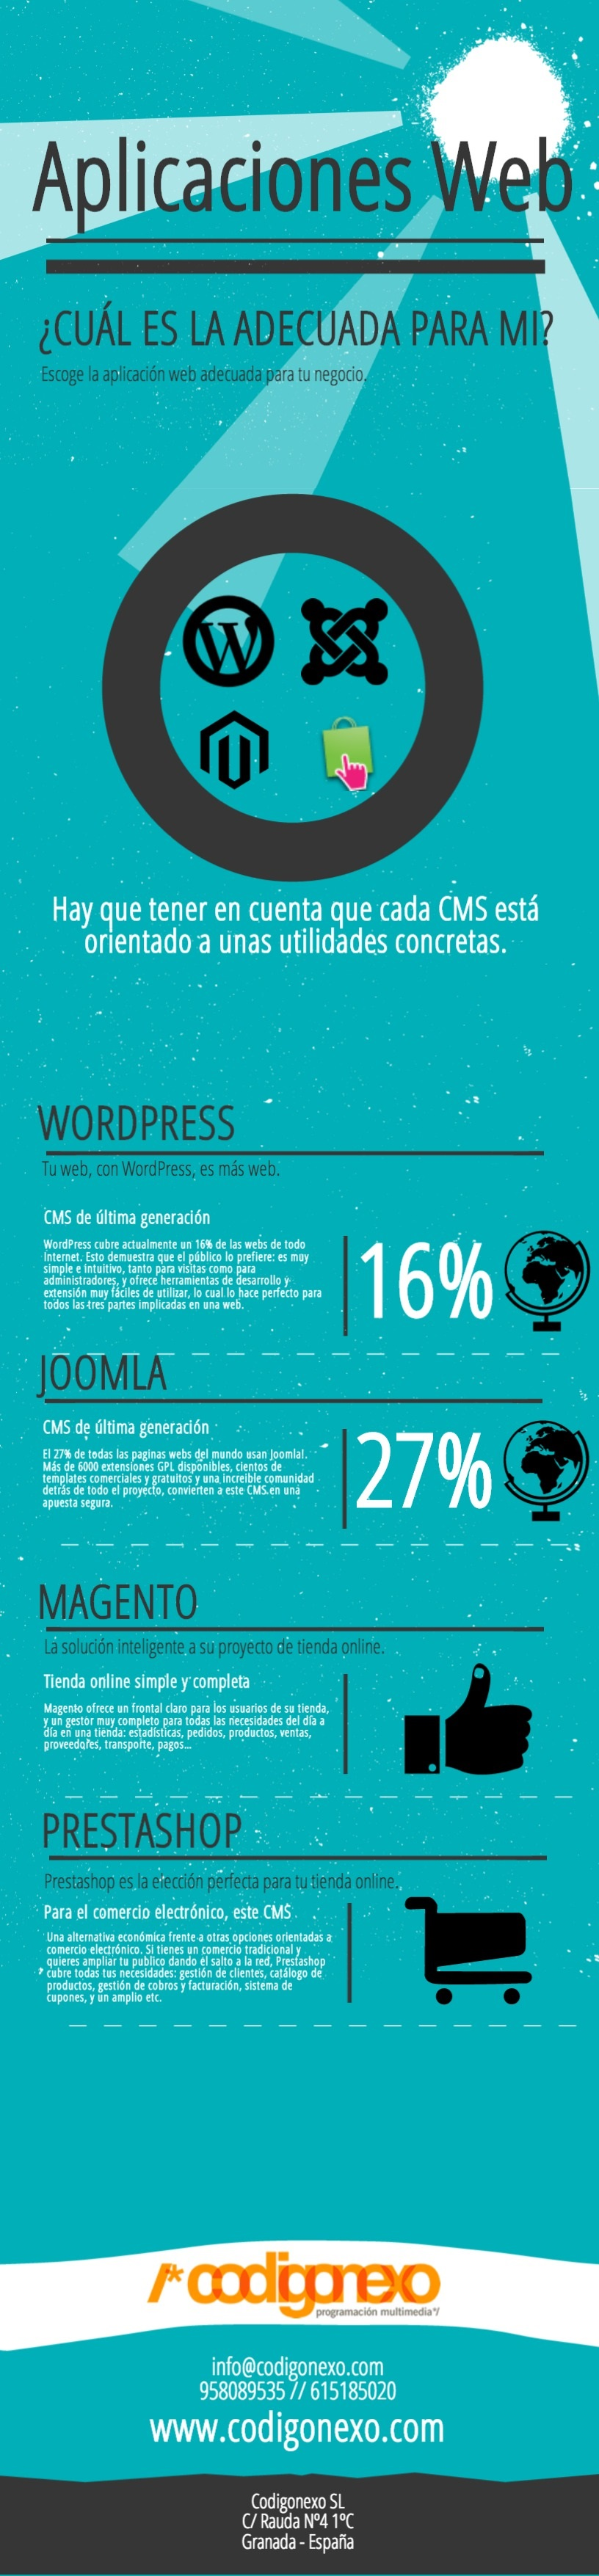 infografia-aplicaciones-web-wordpress-joomla-prestashop-magento